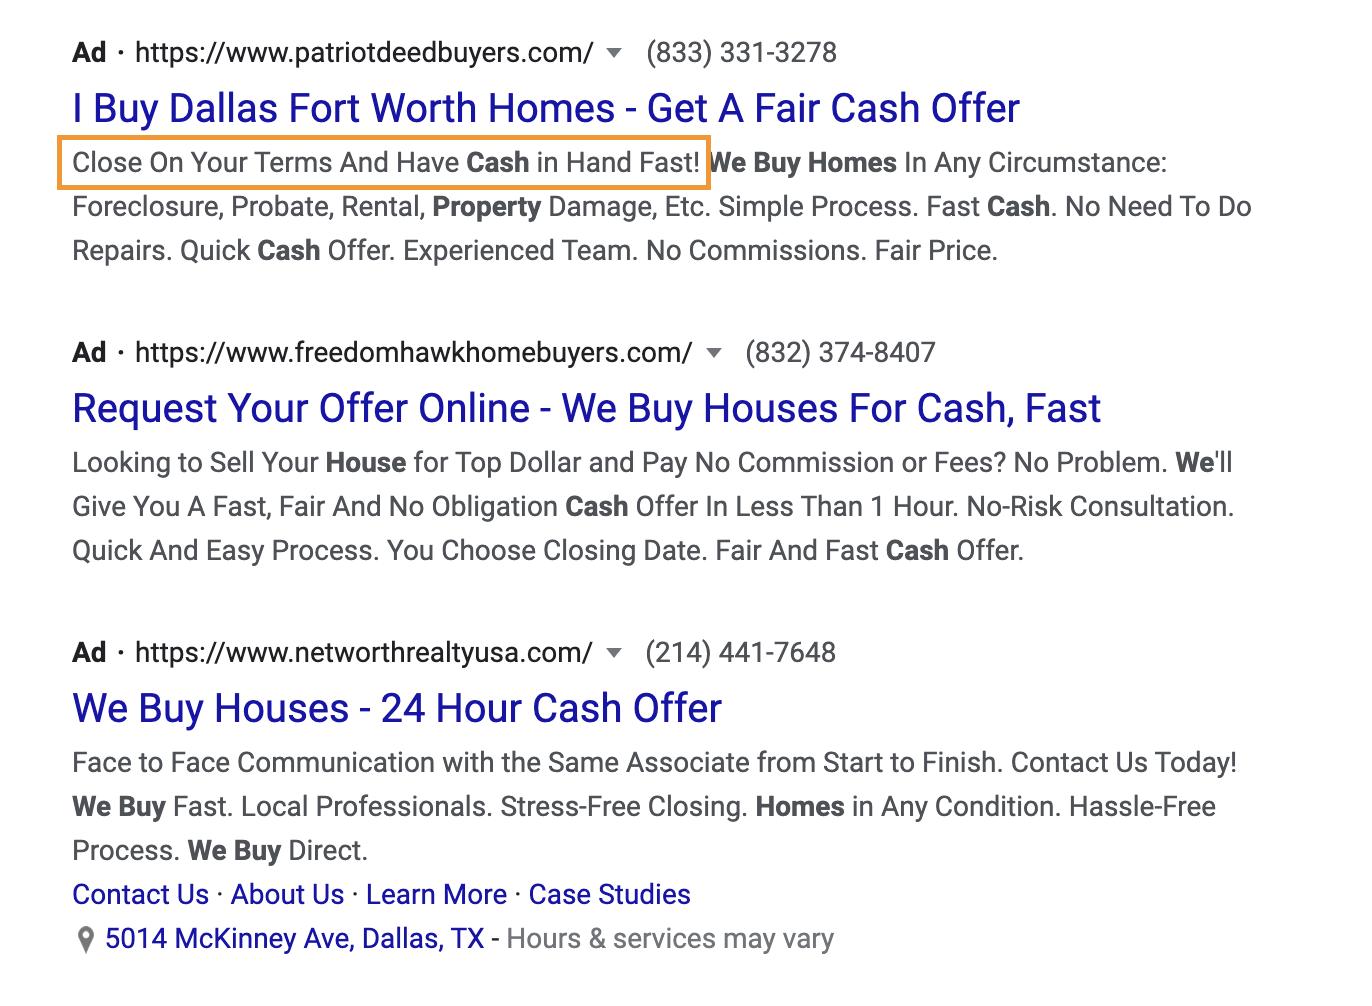 google ads Use Emotion and Senses